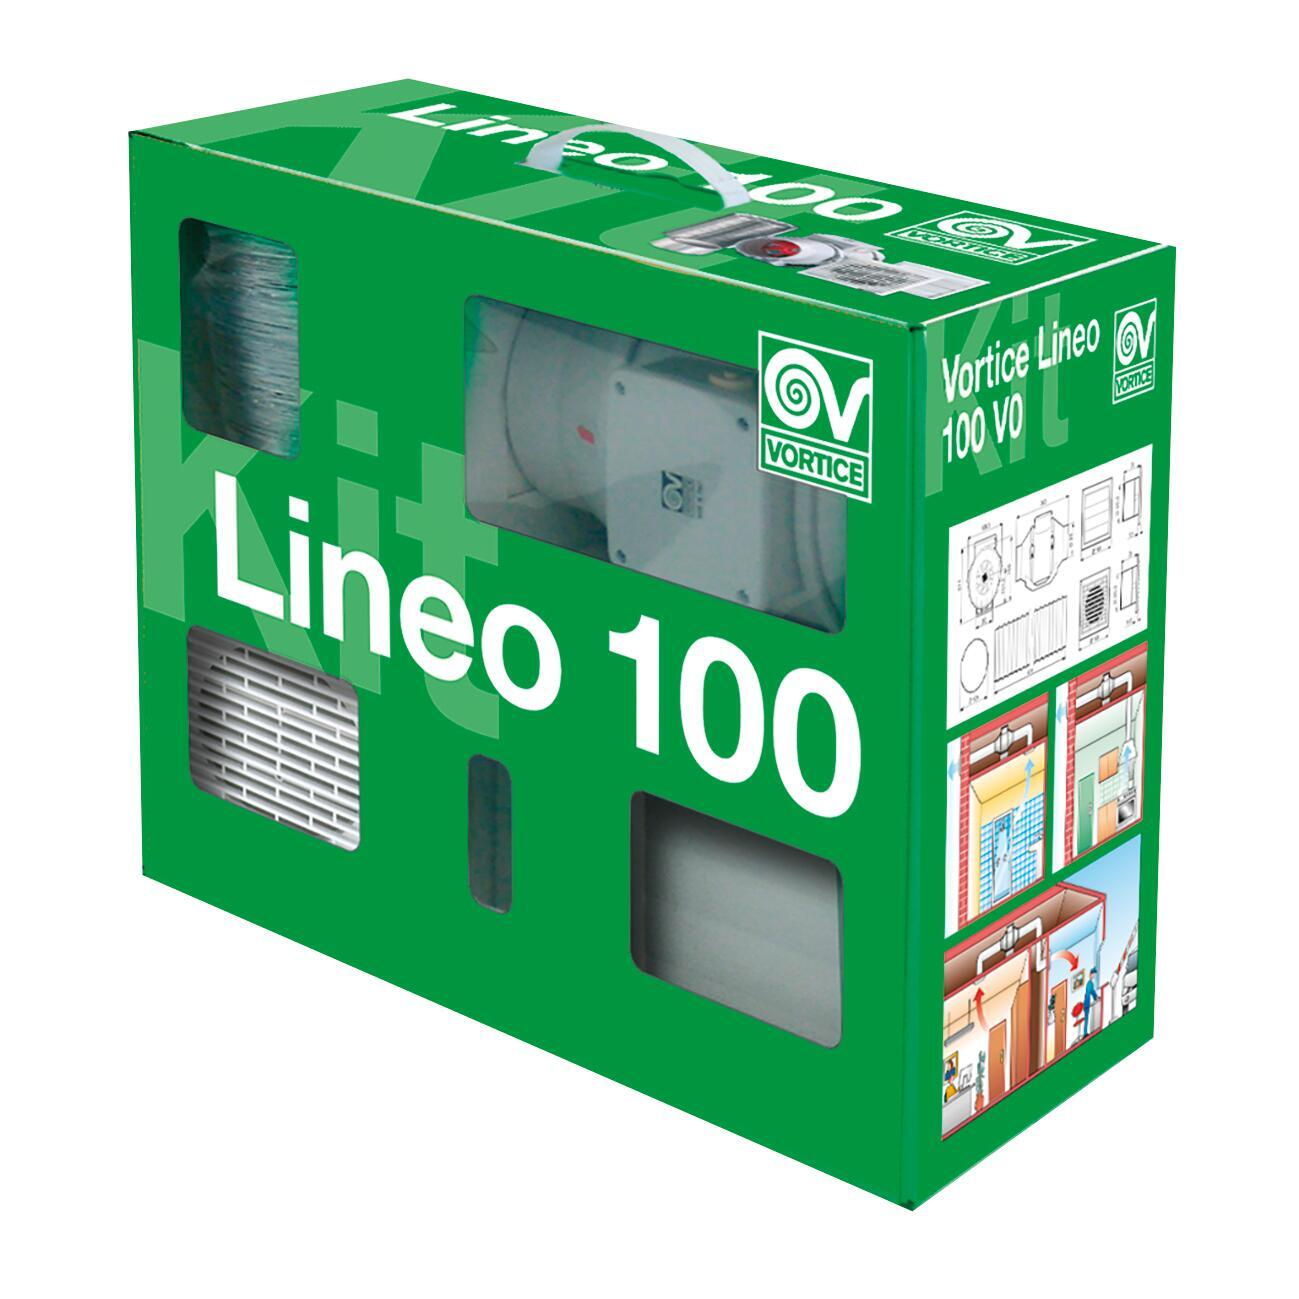 Aspiratore VORTICE LINEO 100 V0/1 Ø 100 mm - 2